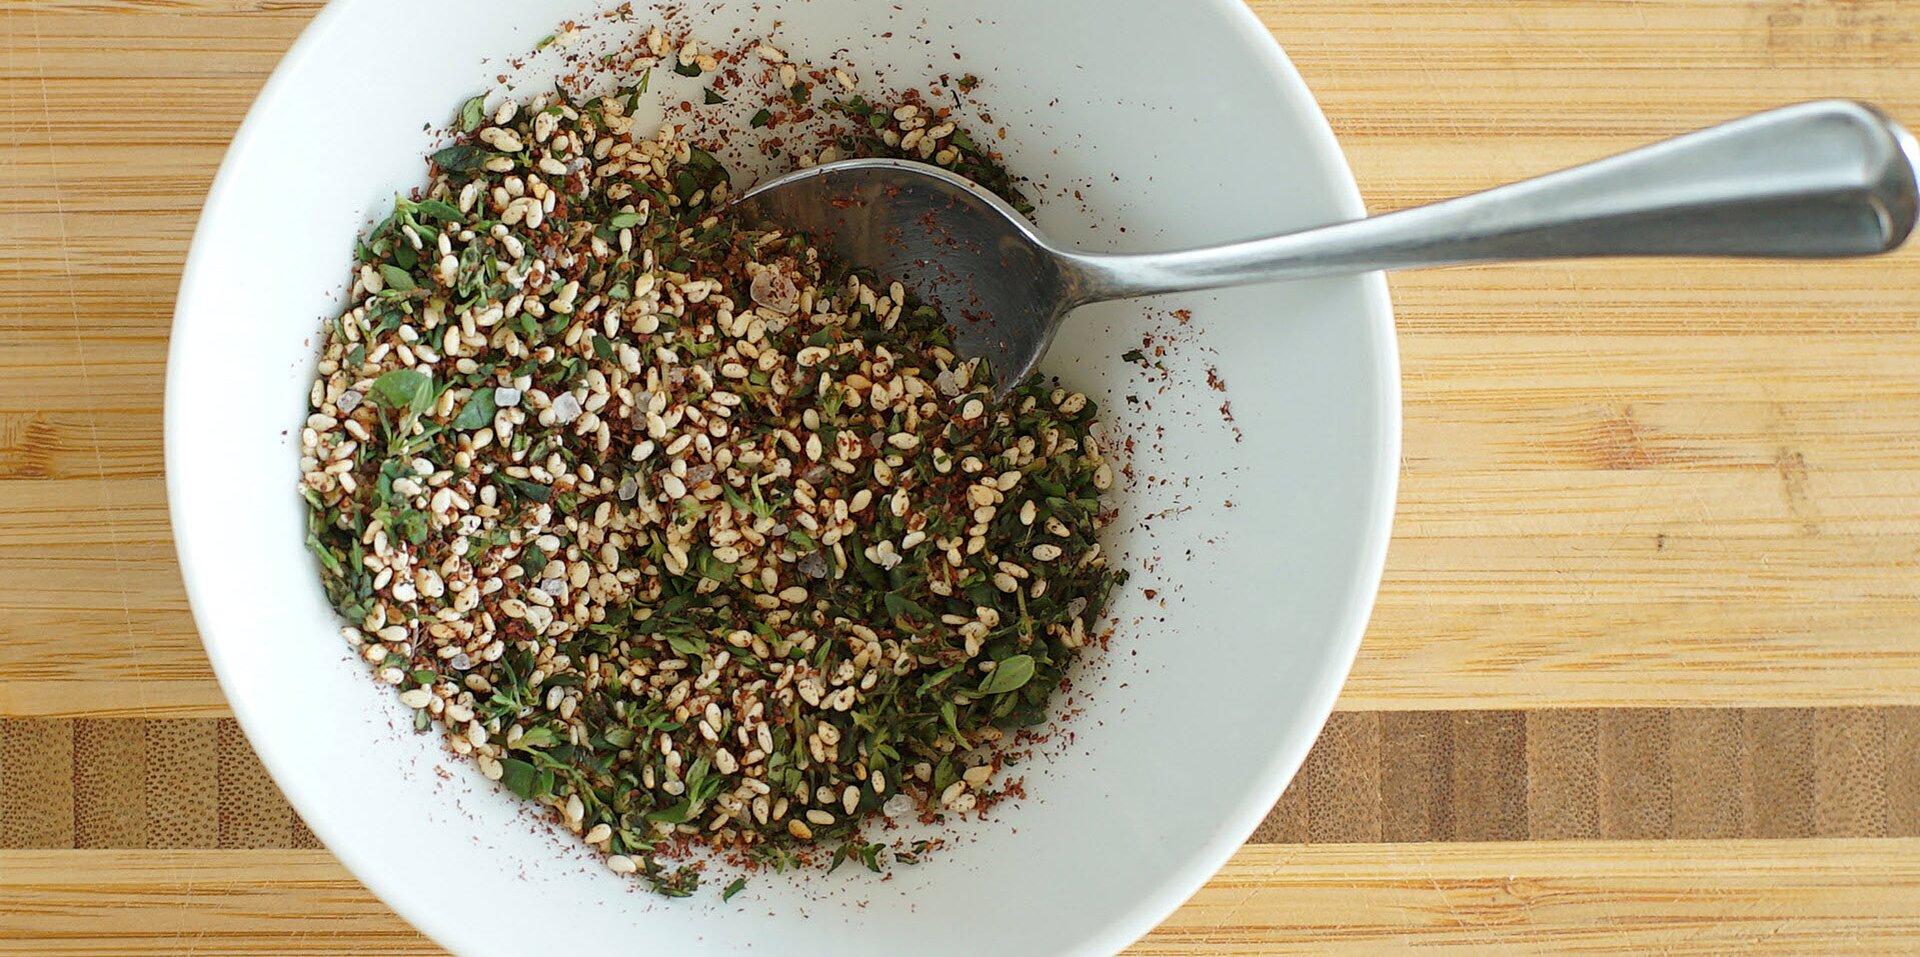 homemade zaatar recipe